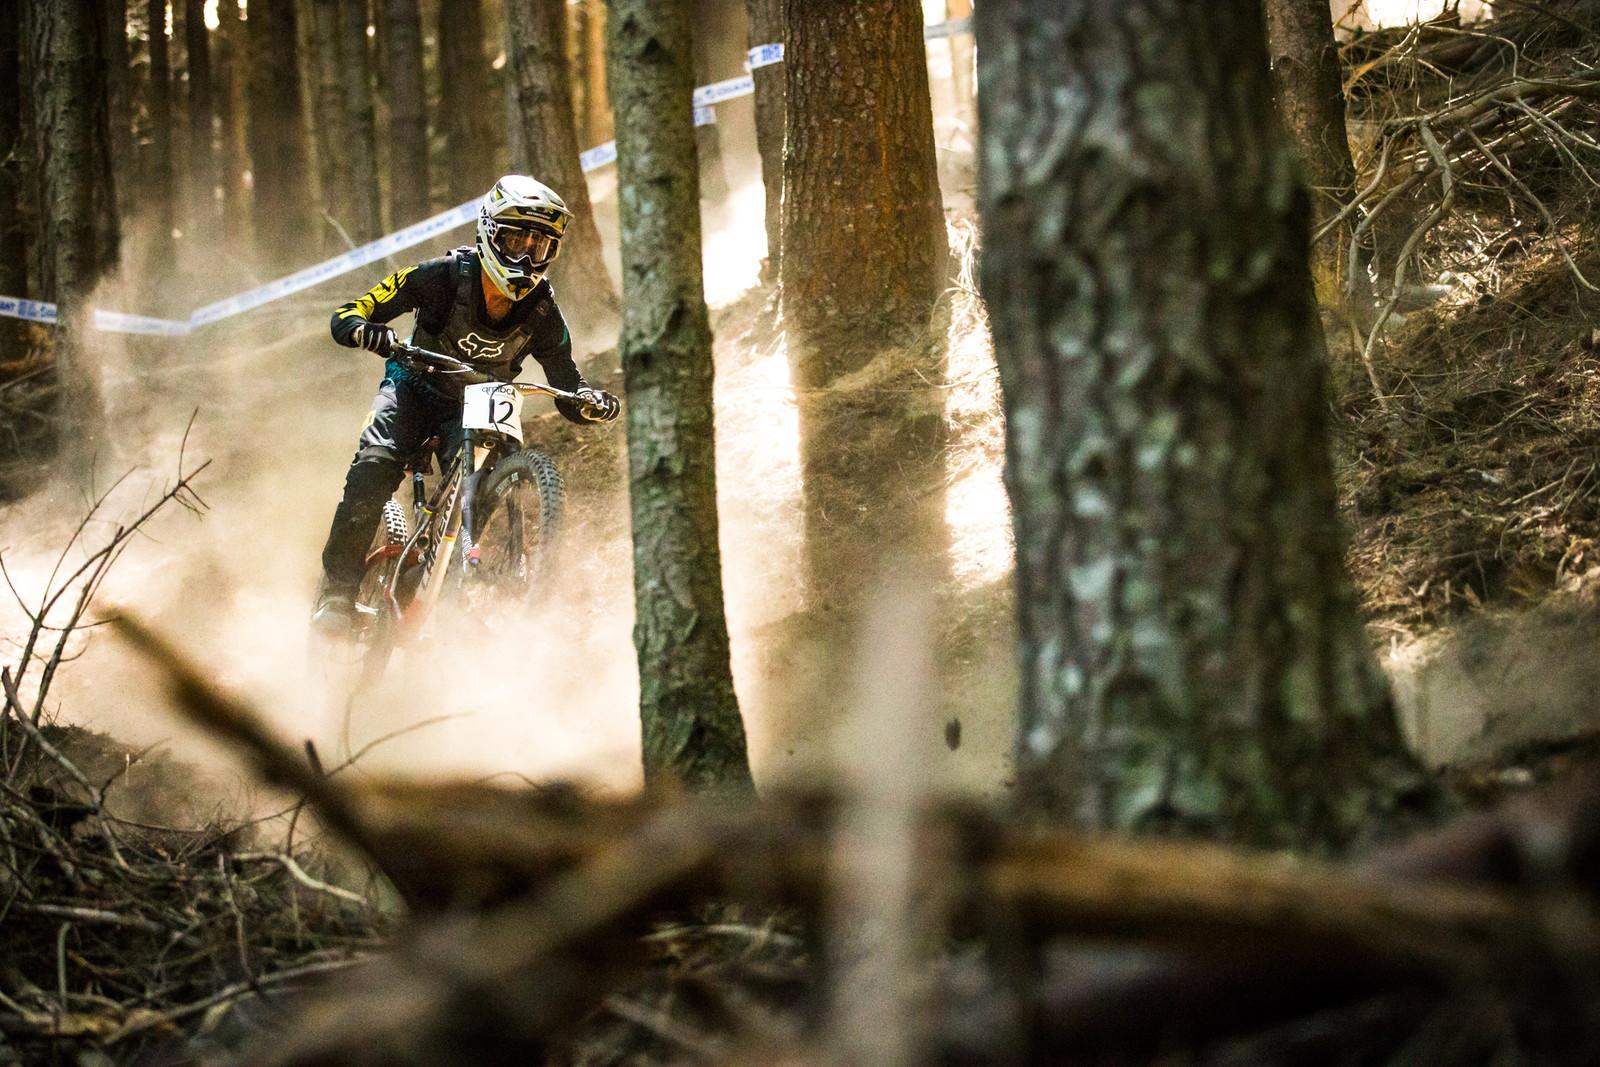 Boucherot Tanguy - Homegrown NZ Downhill - Vertigo Bikes Ride More DH Series Race 1 - Mountain Biking Pictures - Vital MTB